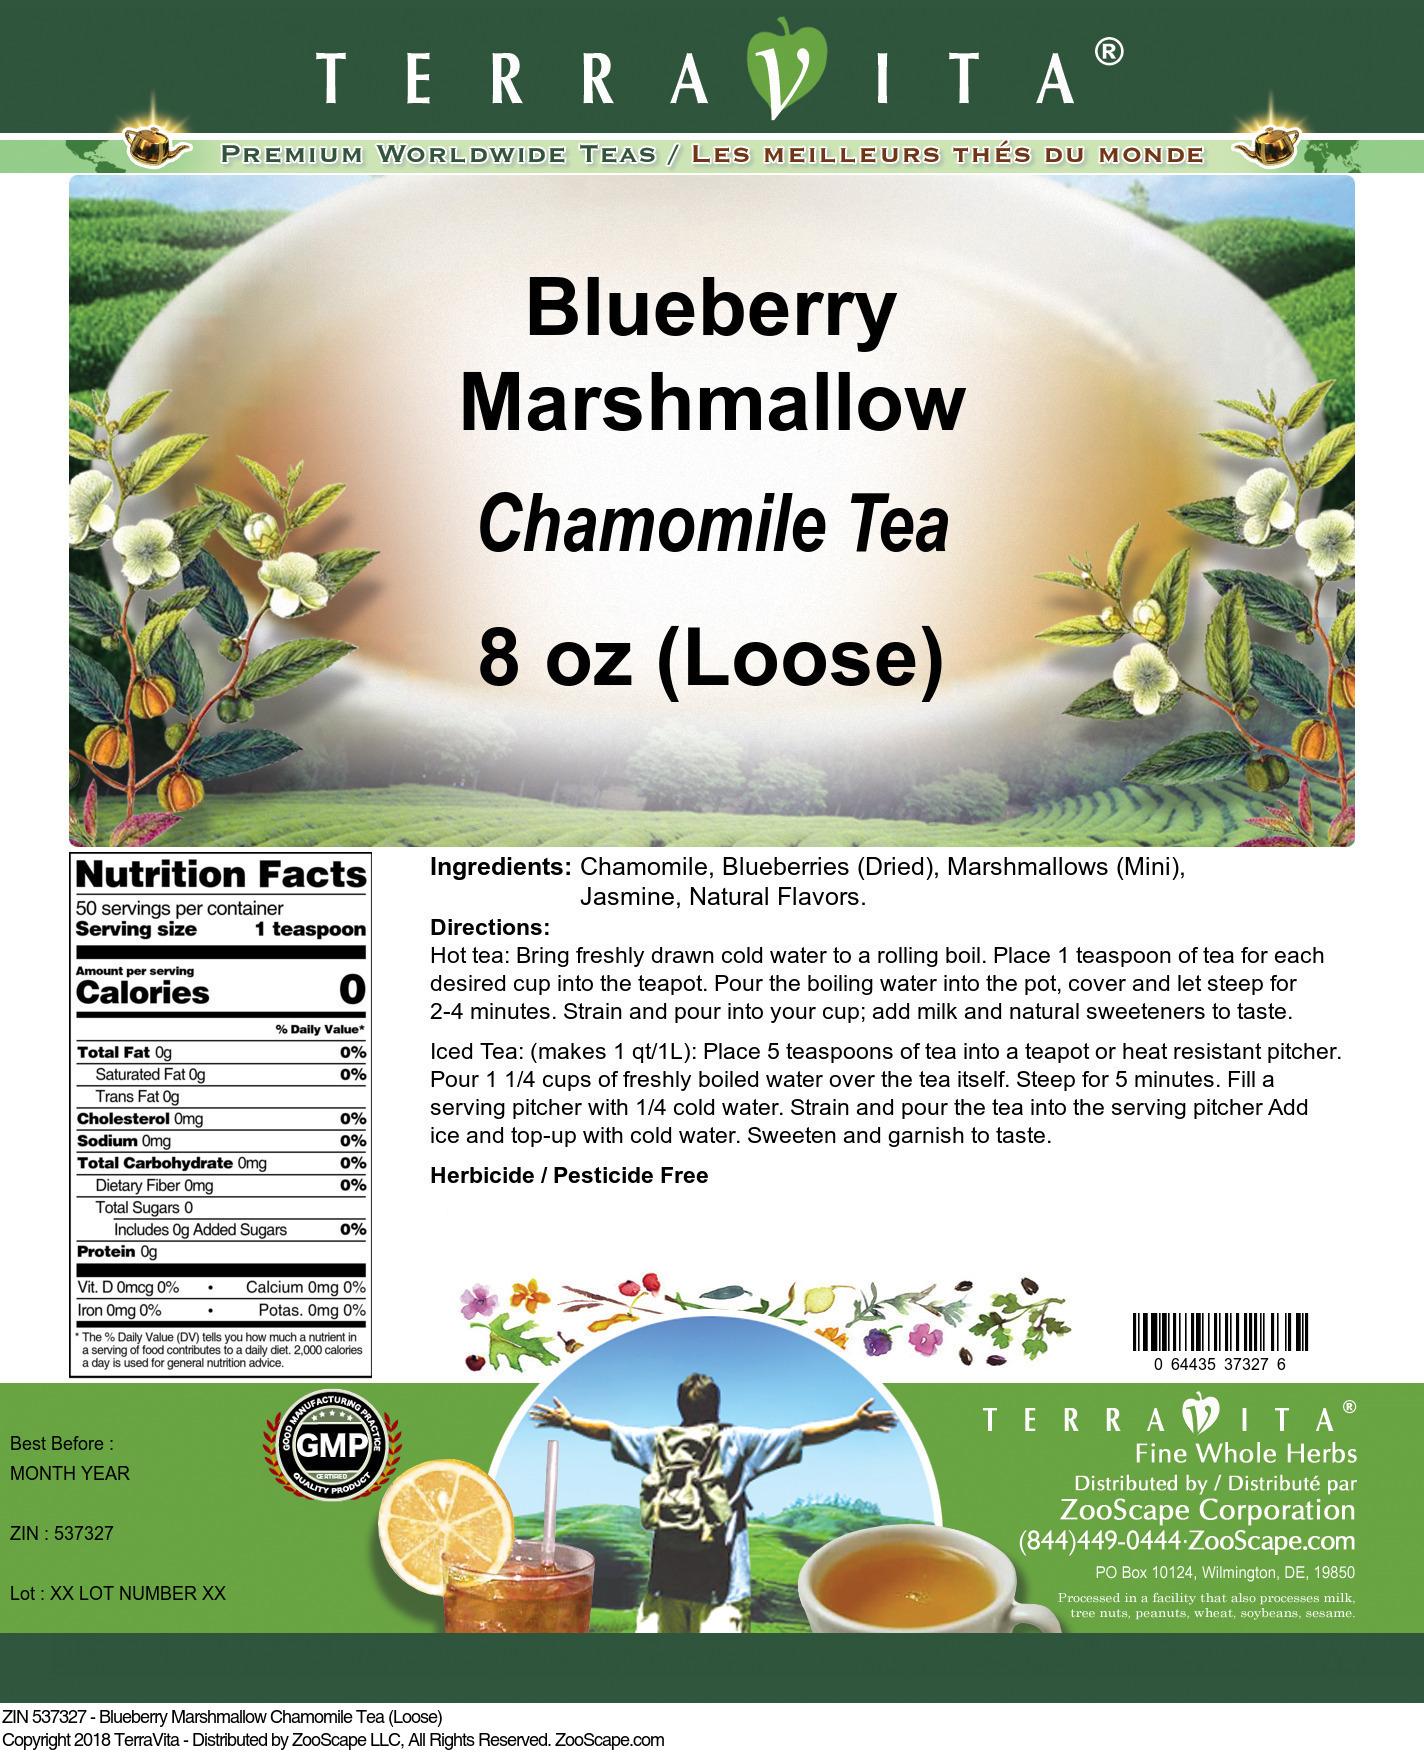 Blueberry Marshmallow Chamomile Tea (Loose)